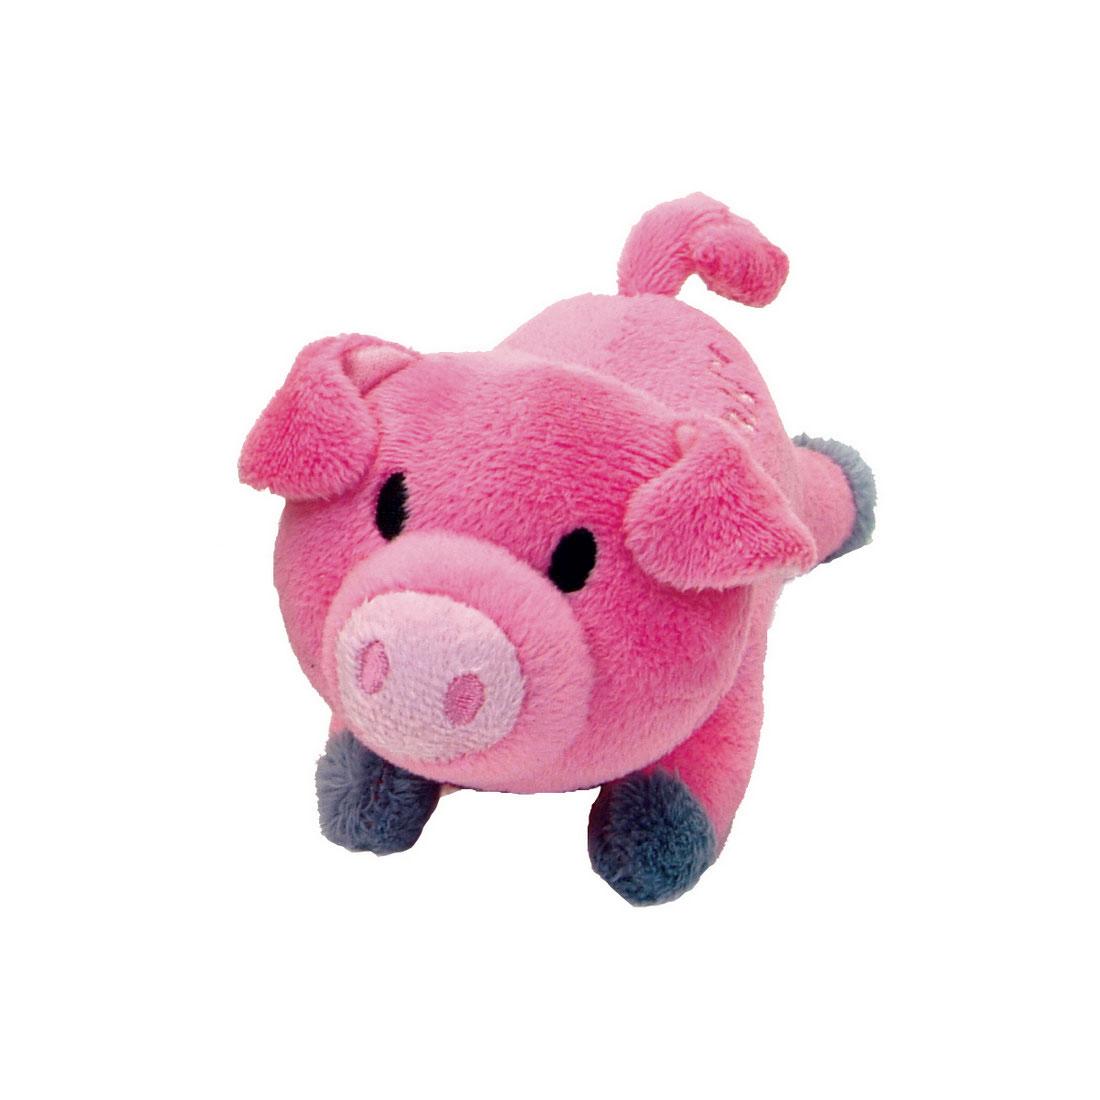 Li'l Pals Pig Plush Dog Toy, 4.5-in